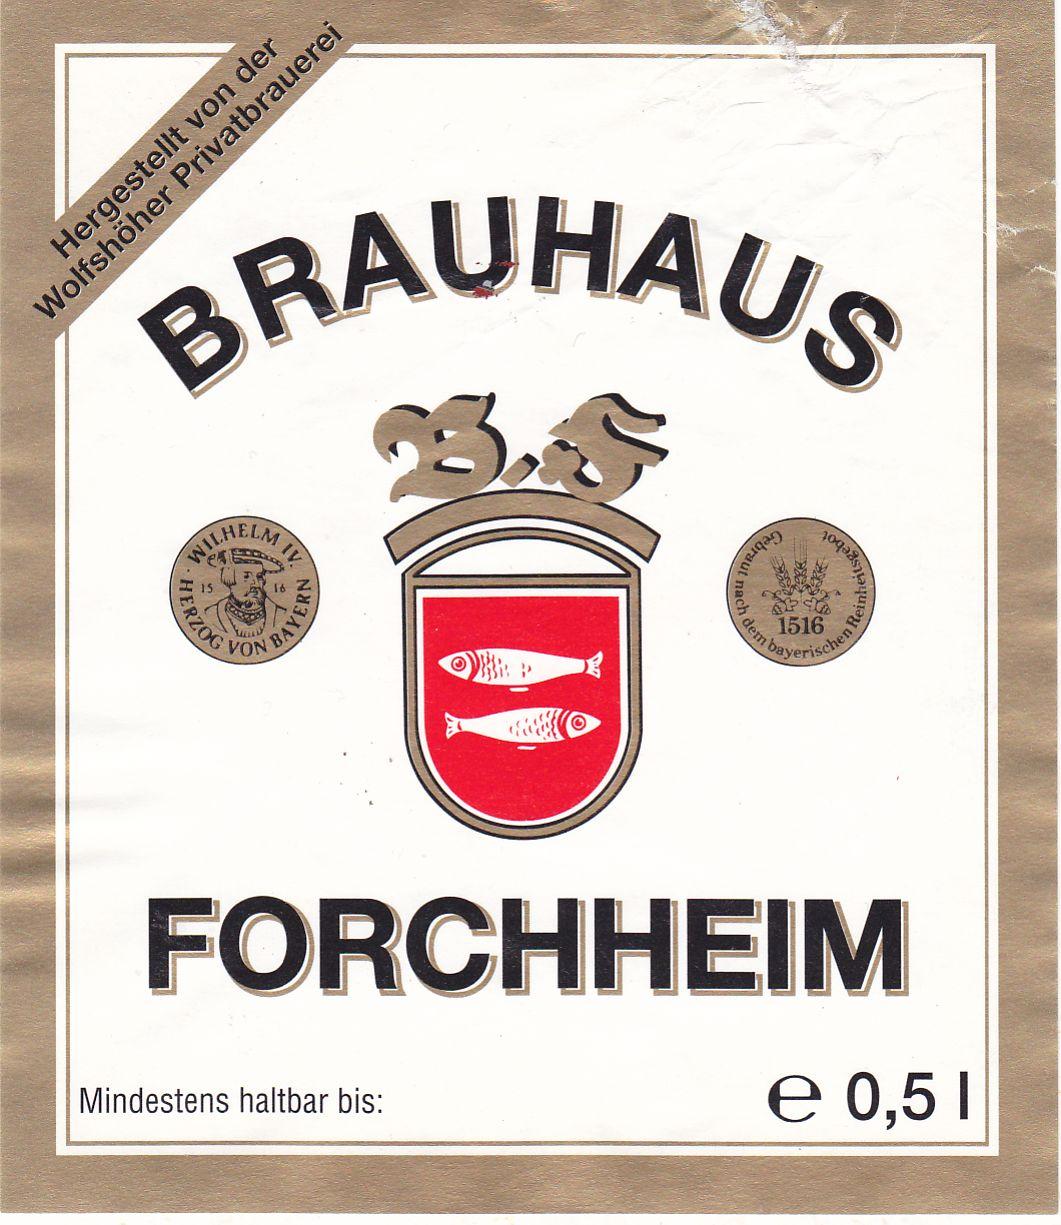 brauhaus-forchheim-1